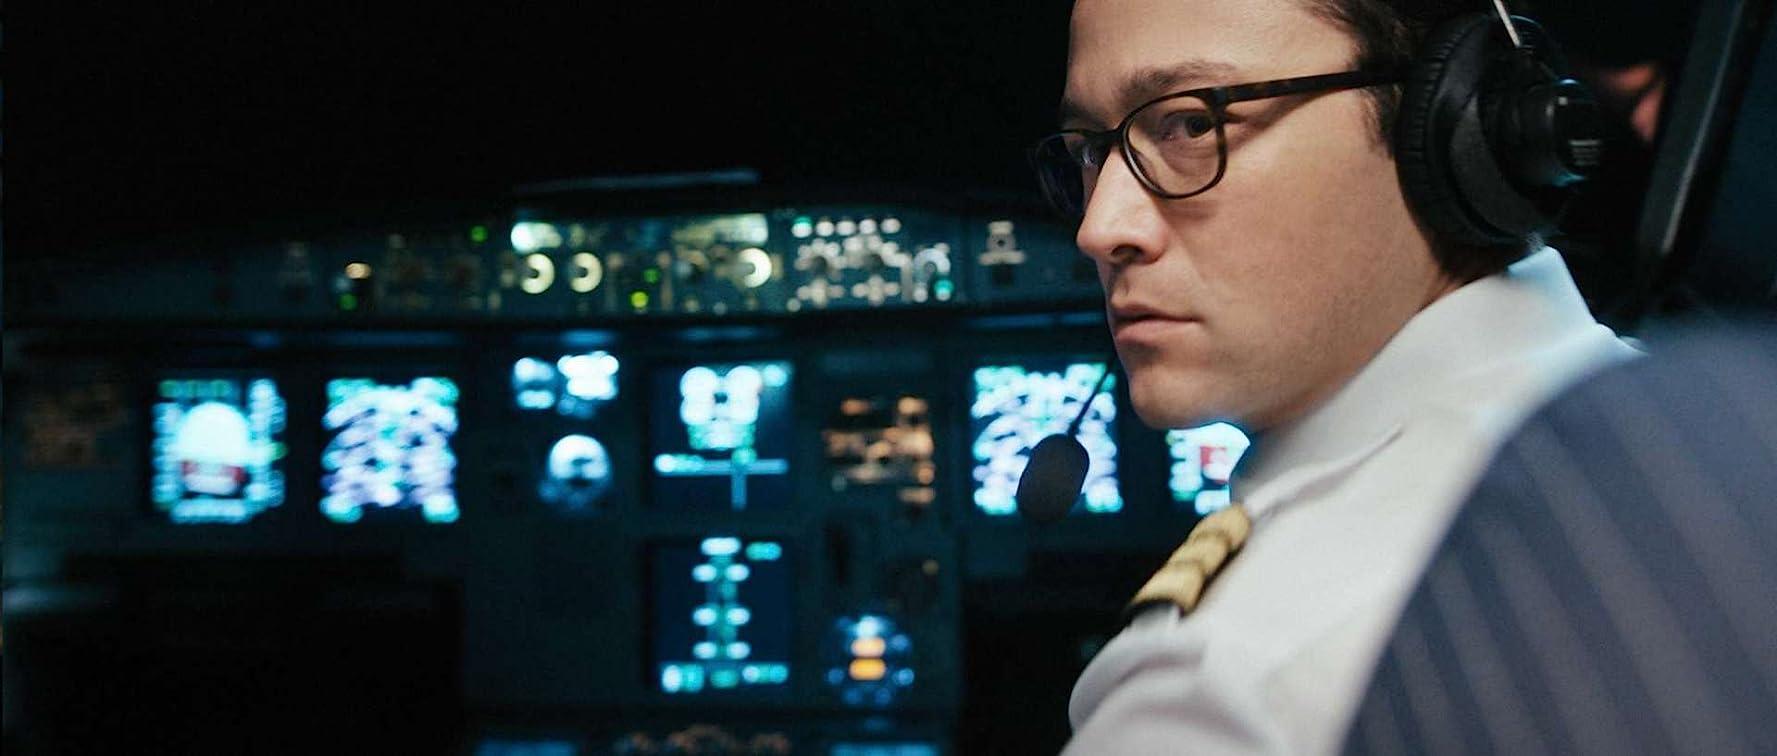 7500 (2019) Film Online Subtitrat in Romana in HD 1080p